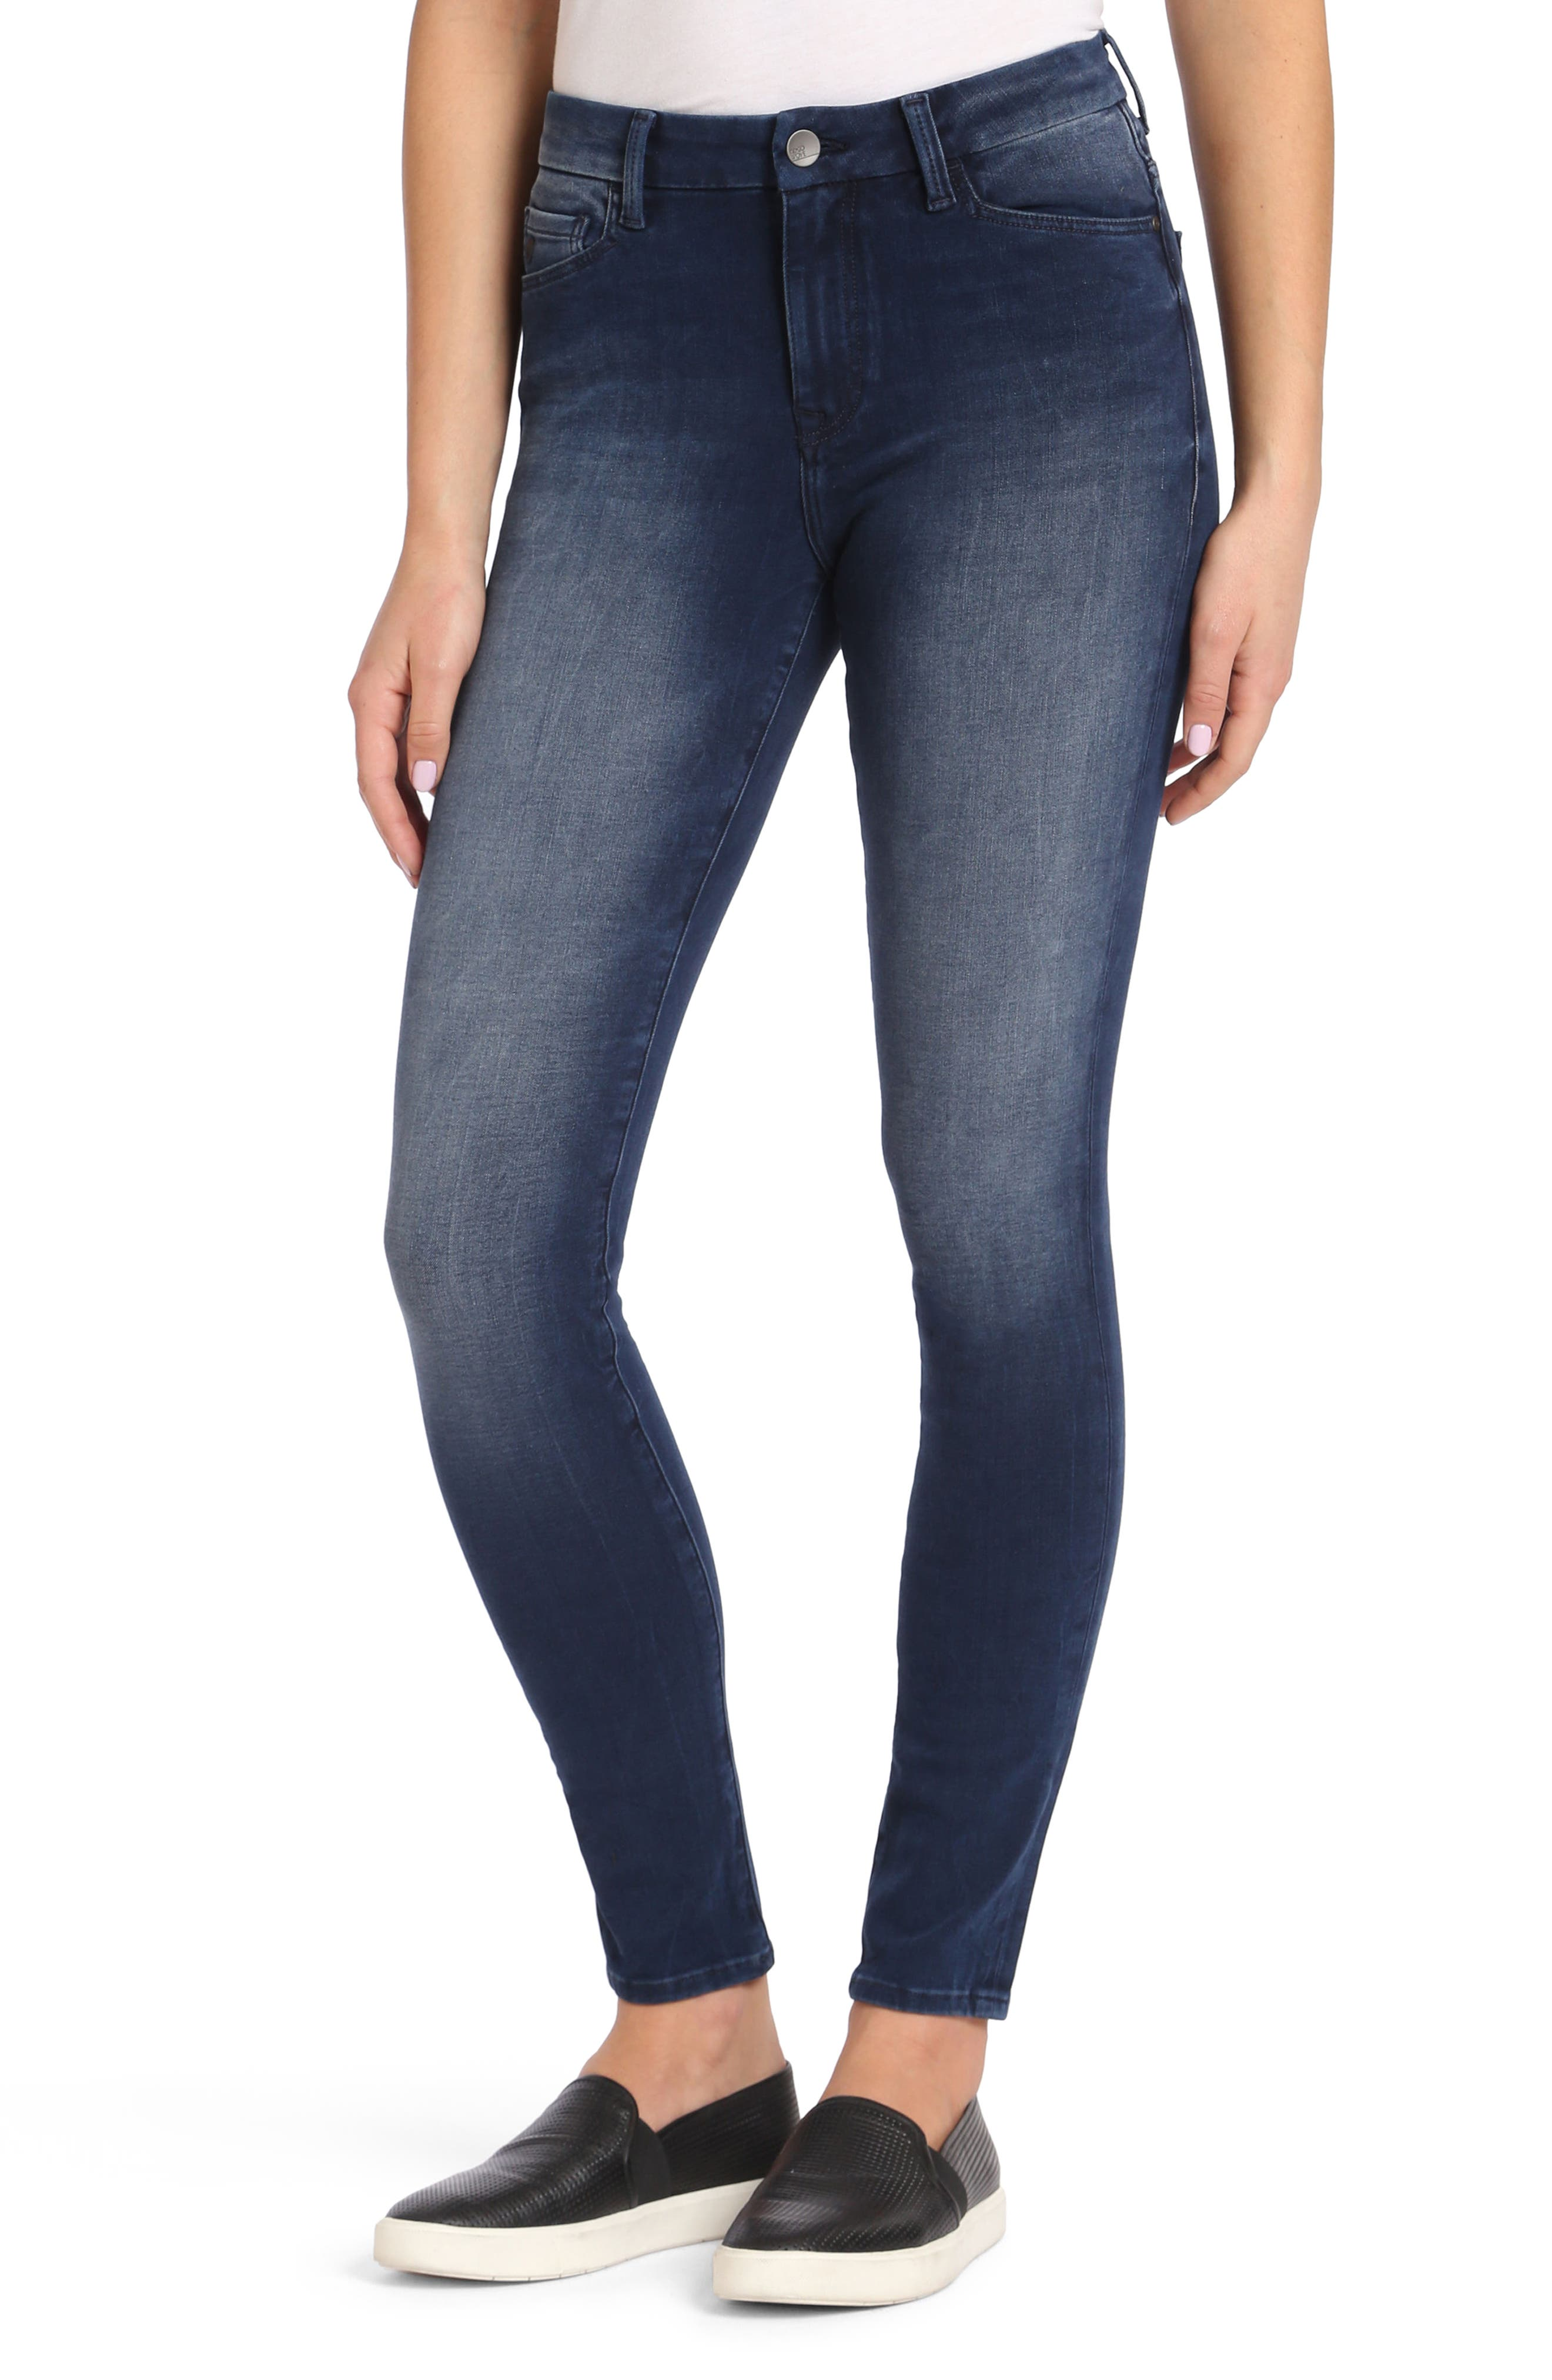 Alissa Stretch Slim High Rise Ankle Jeans,                         Main,                         color, Ink Bi Stretch